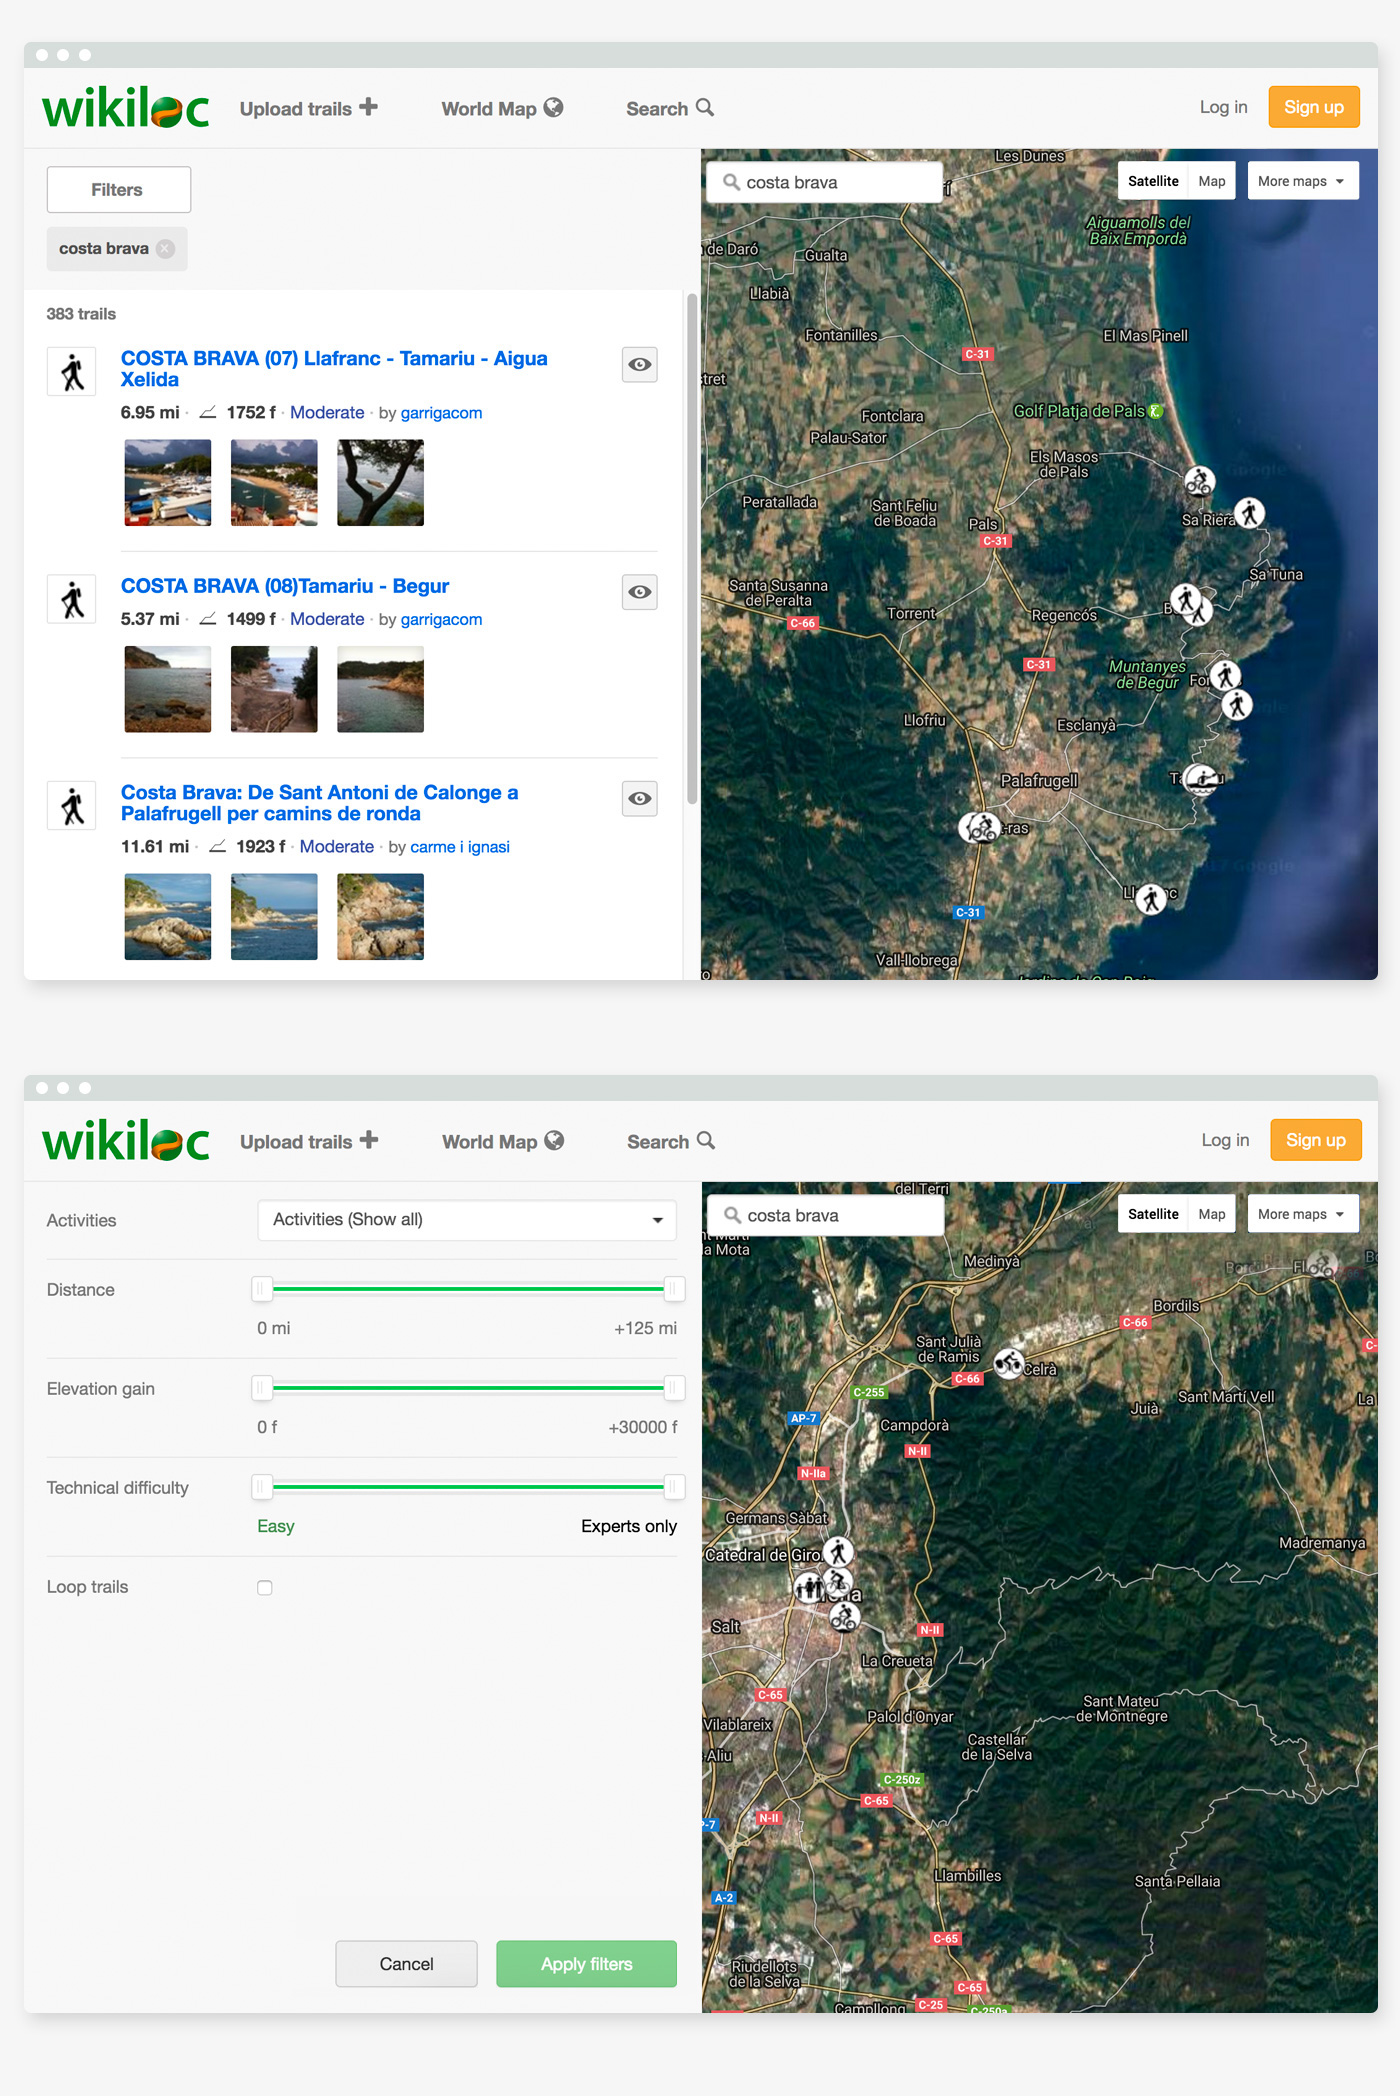 ux/ui user interface Interaction design  visual design